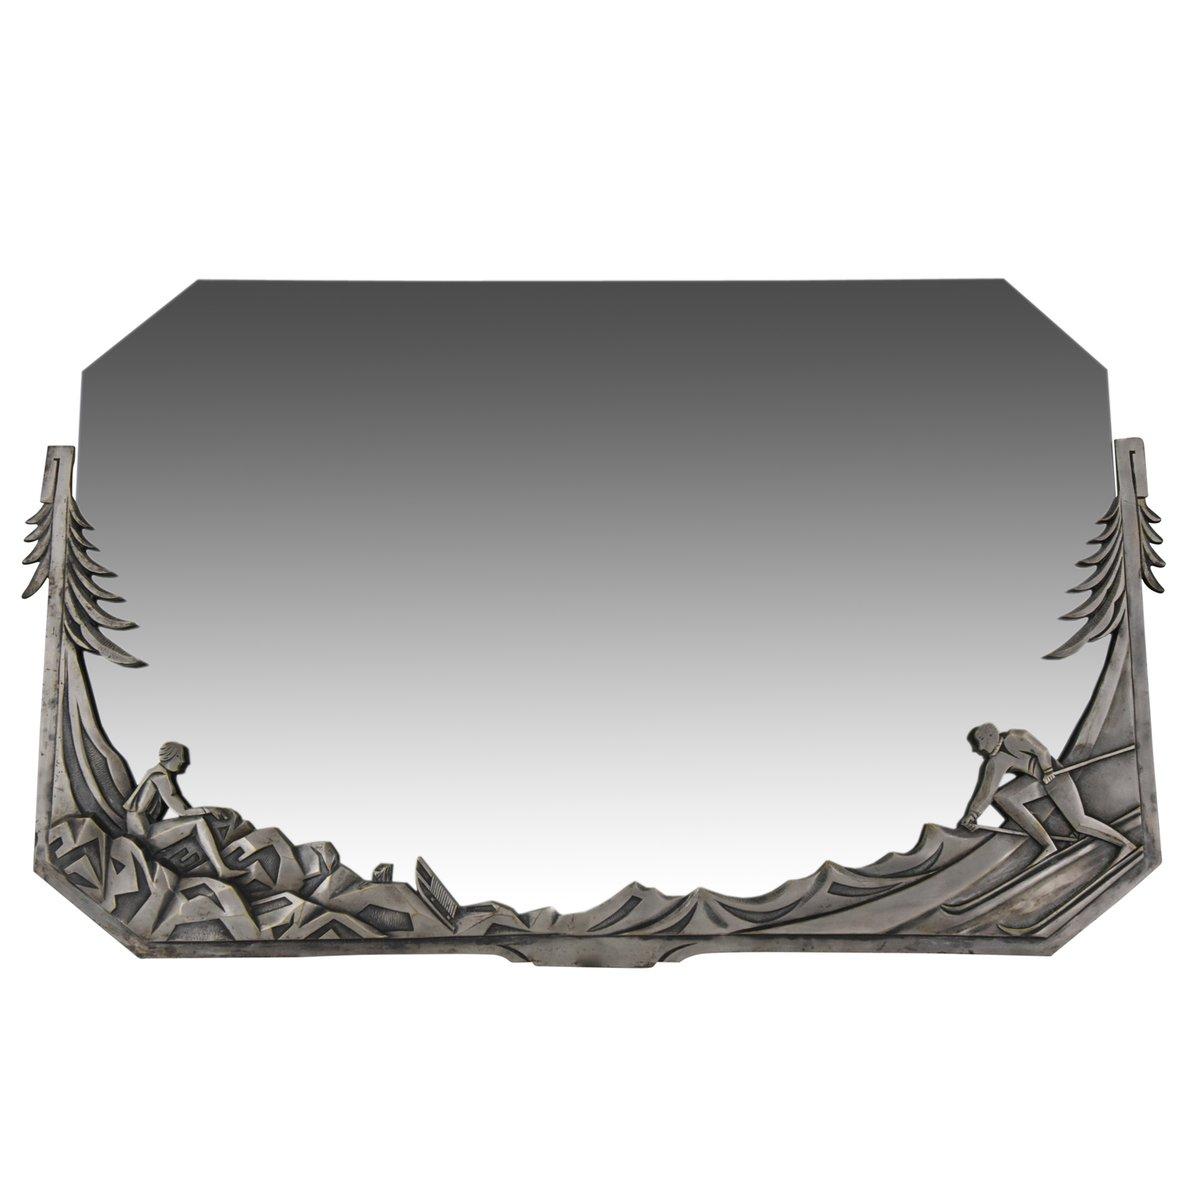 miroir art deco en bronze argent france 1920s en vente. Black Bedroom Furniture Sets. Home Design Ideas